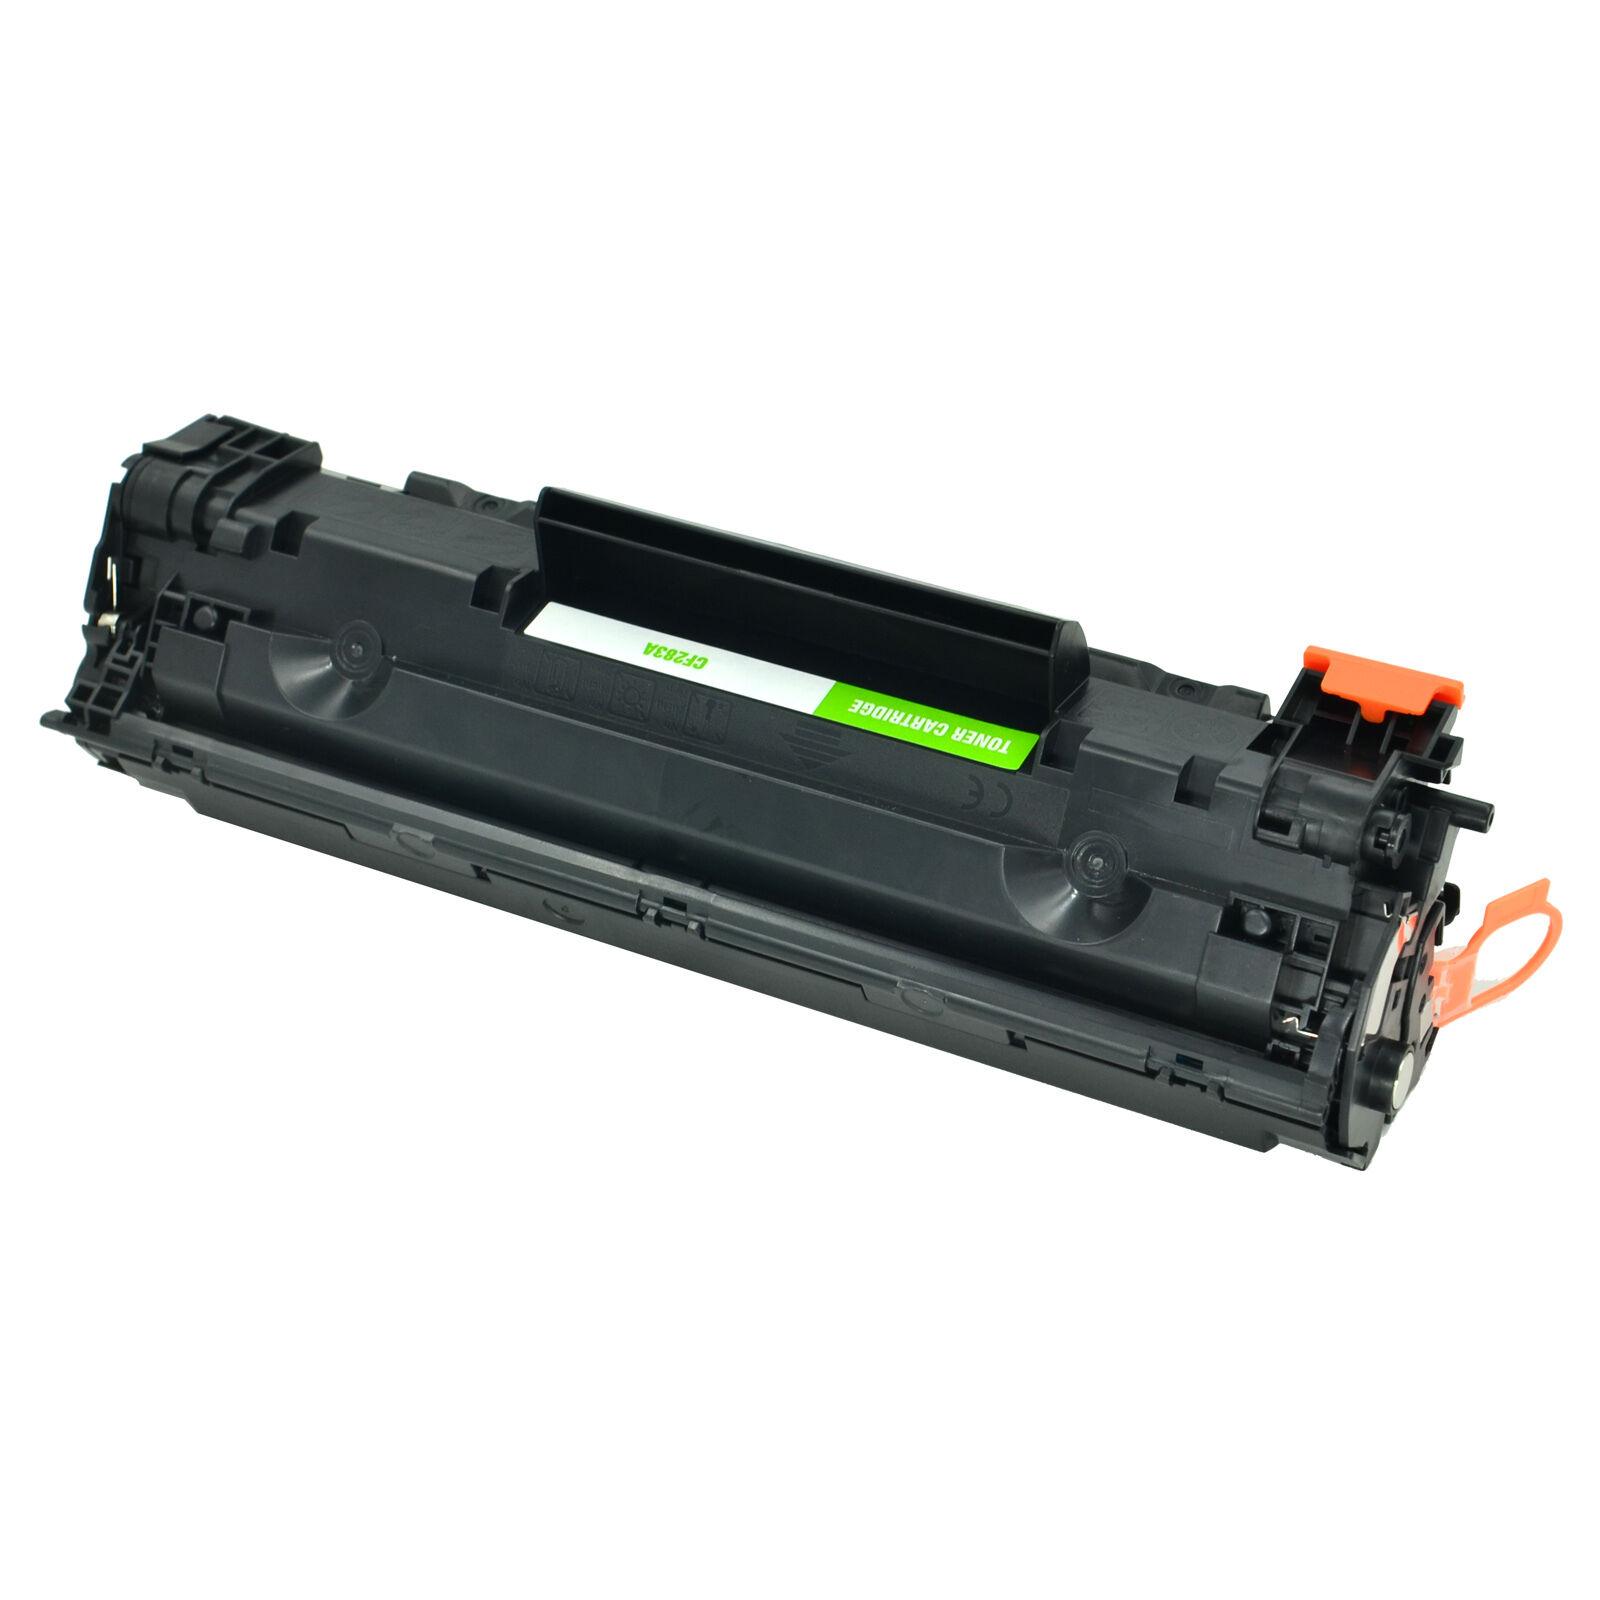 1pk Cf283a 83a Toner Cartridge For Hp Laserjet Pro Mfp